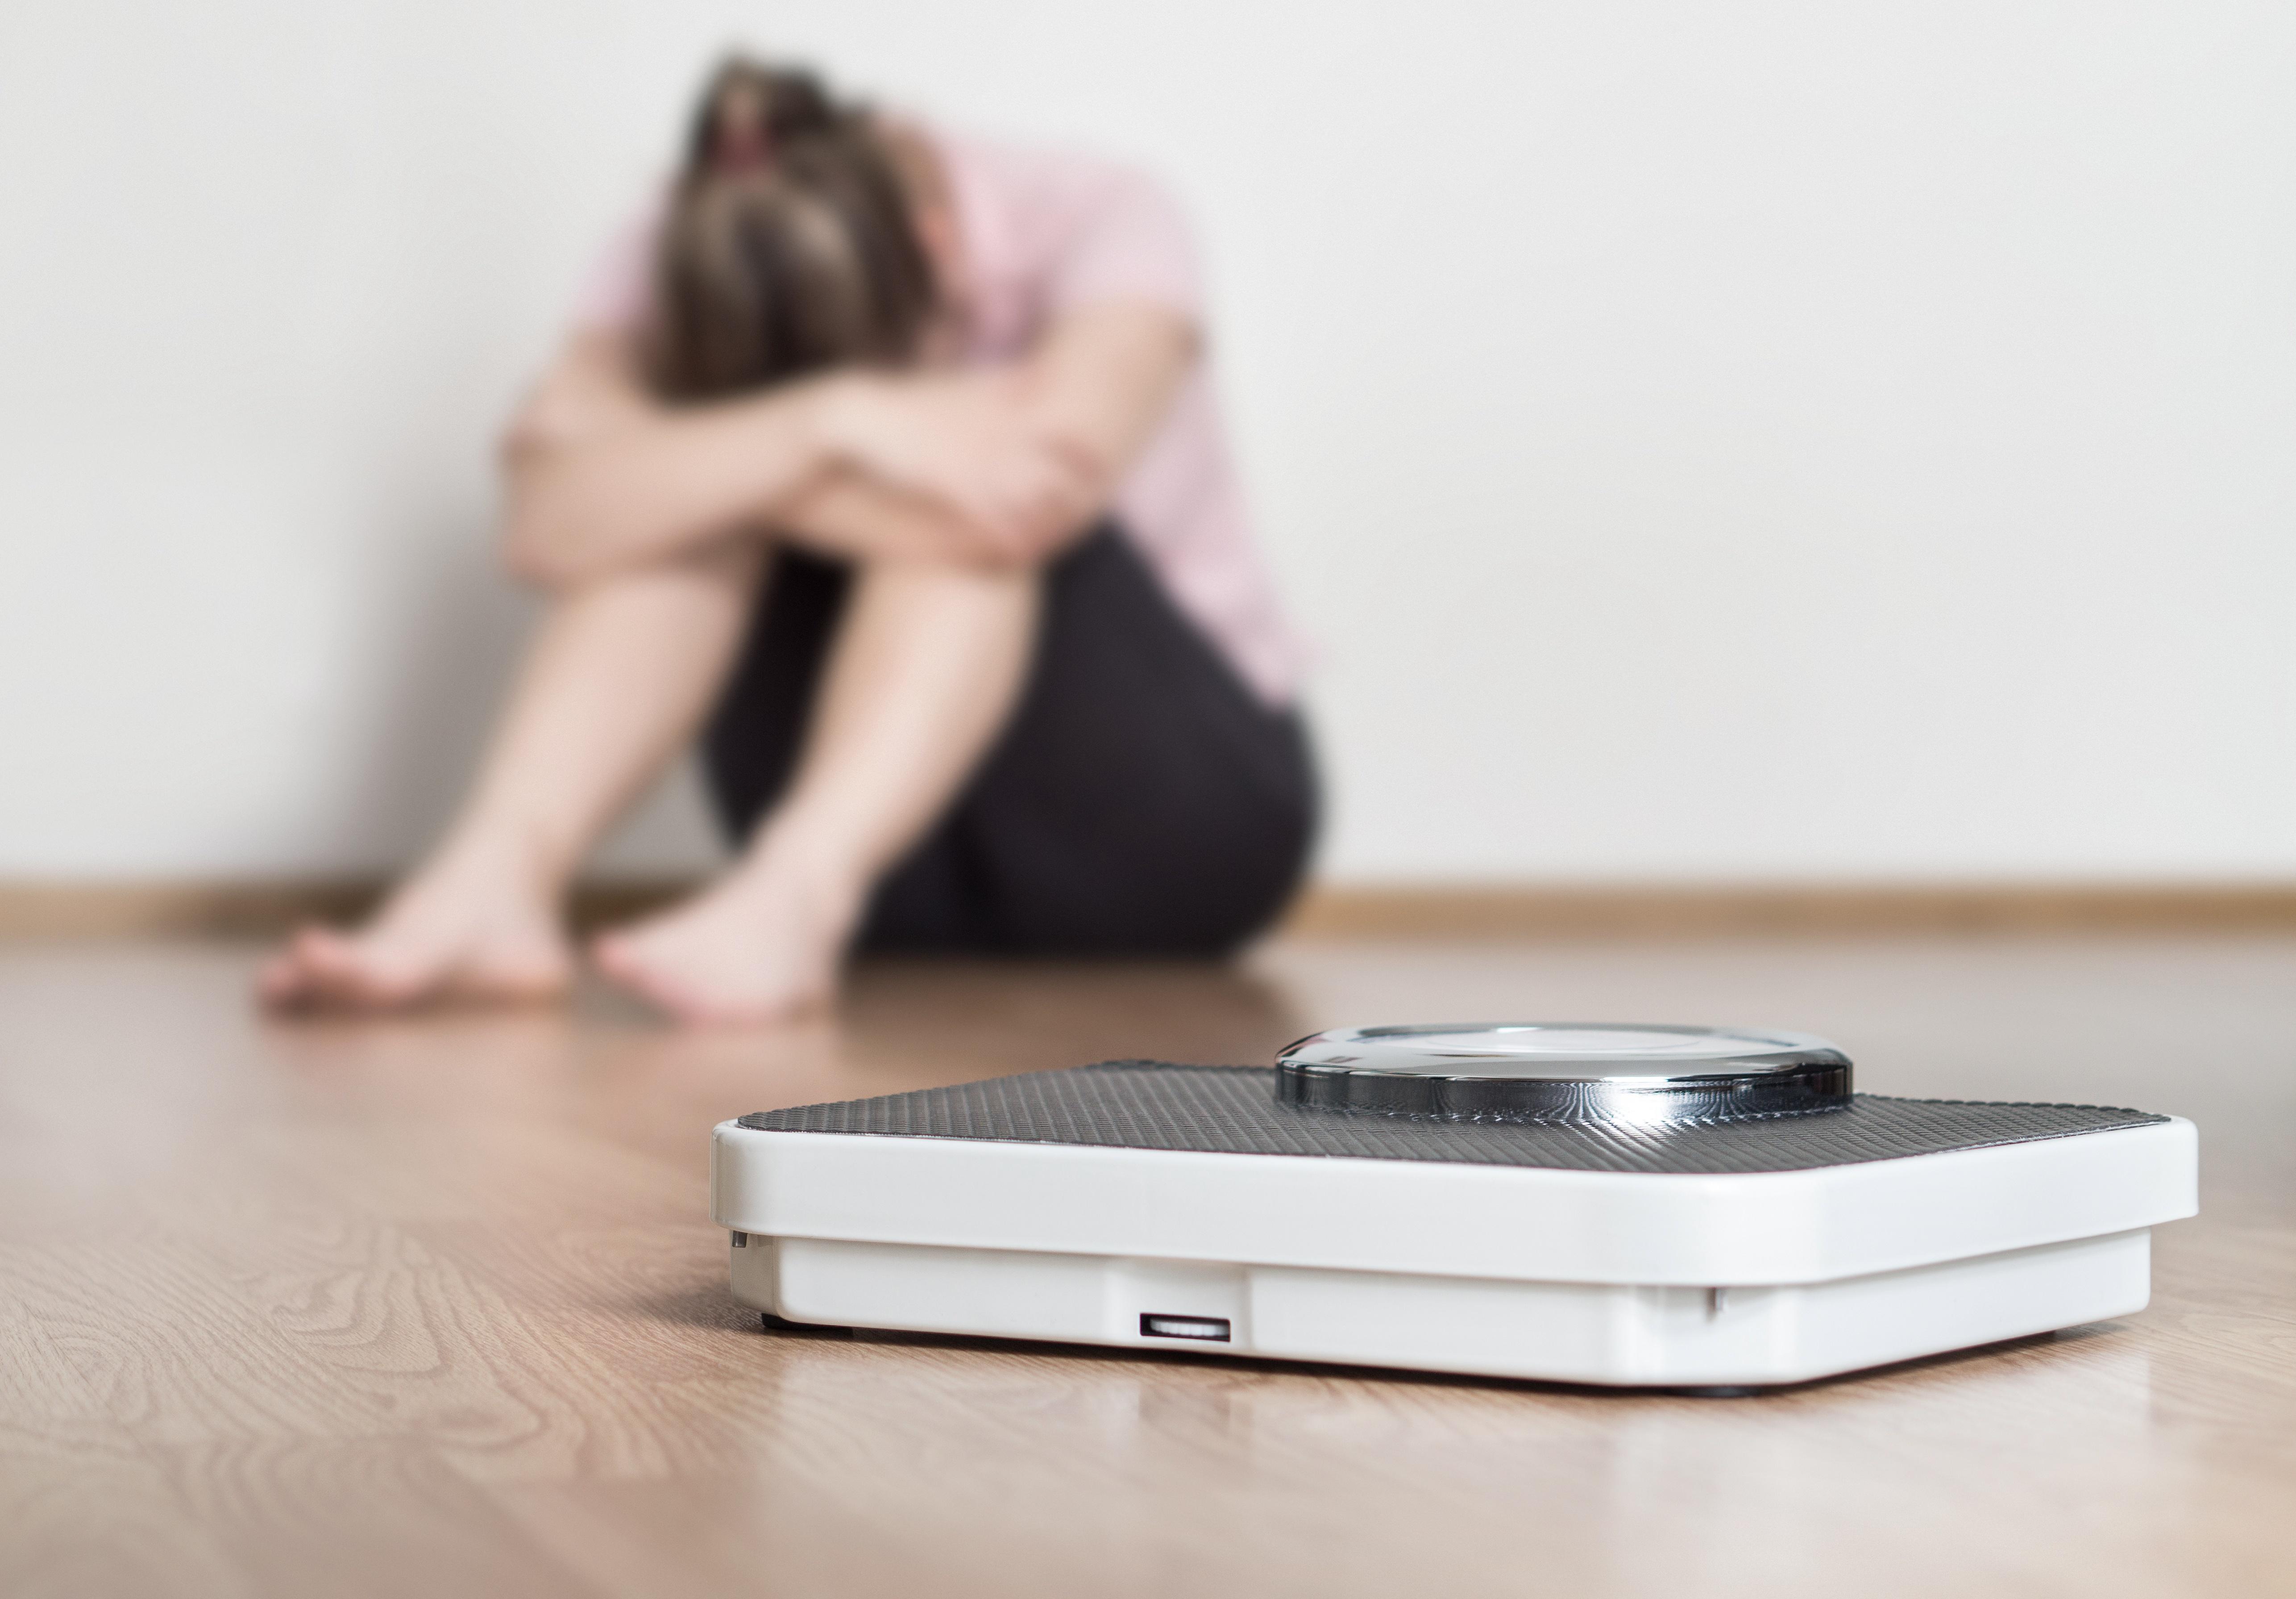 NIFS | Weight loss frustration